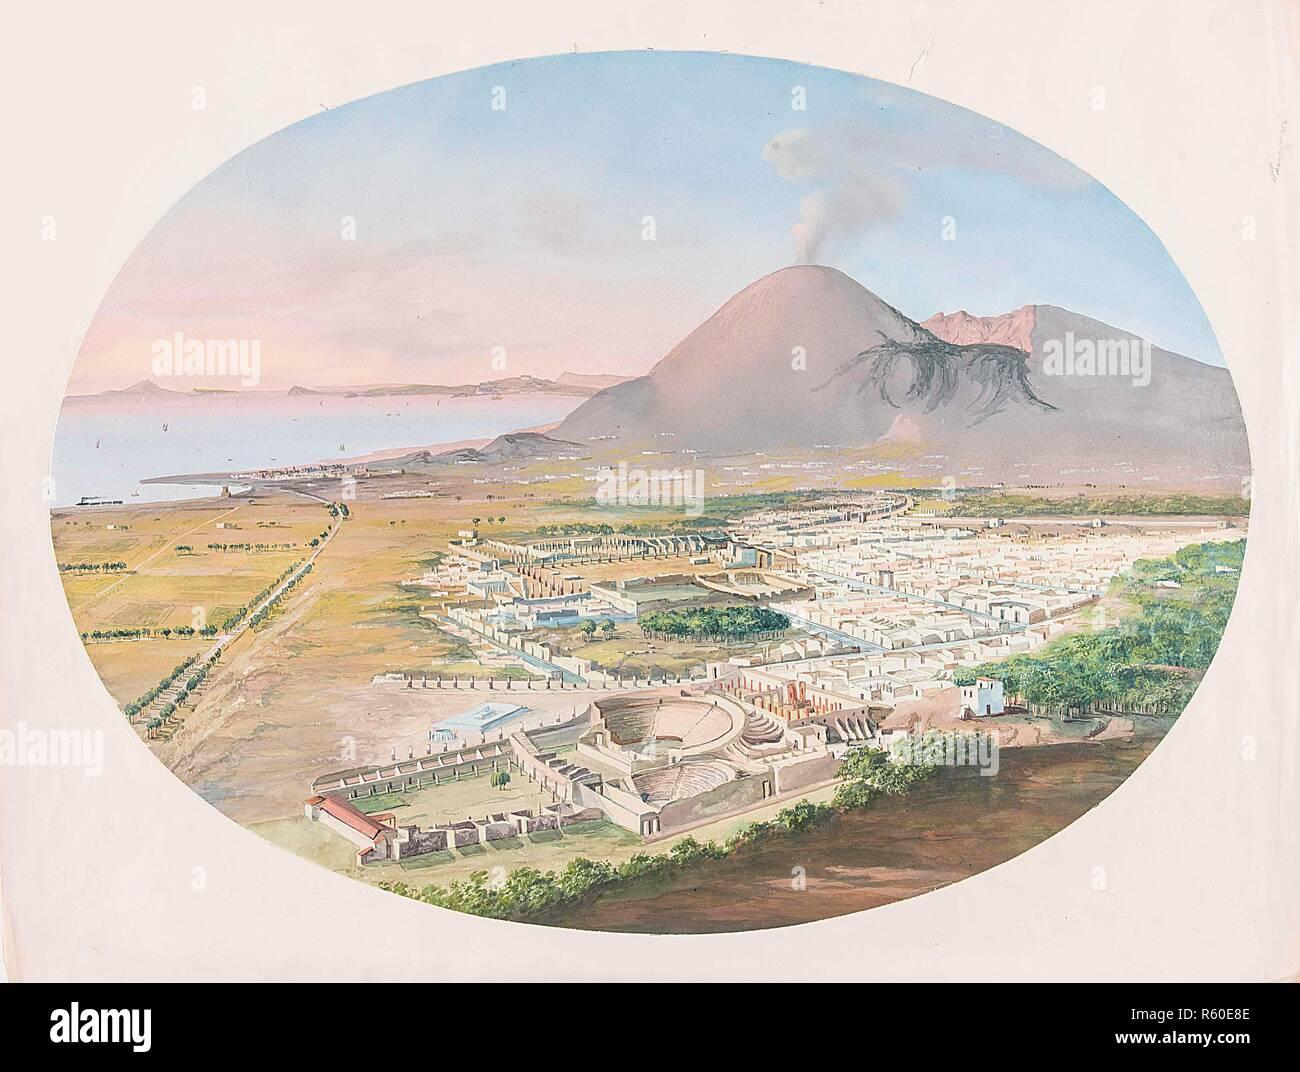 The excavations of Pompeii Vesuvius with reconstructions.jpg - R60E8E - Stock Image